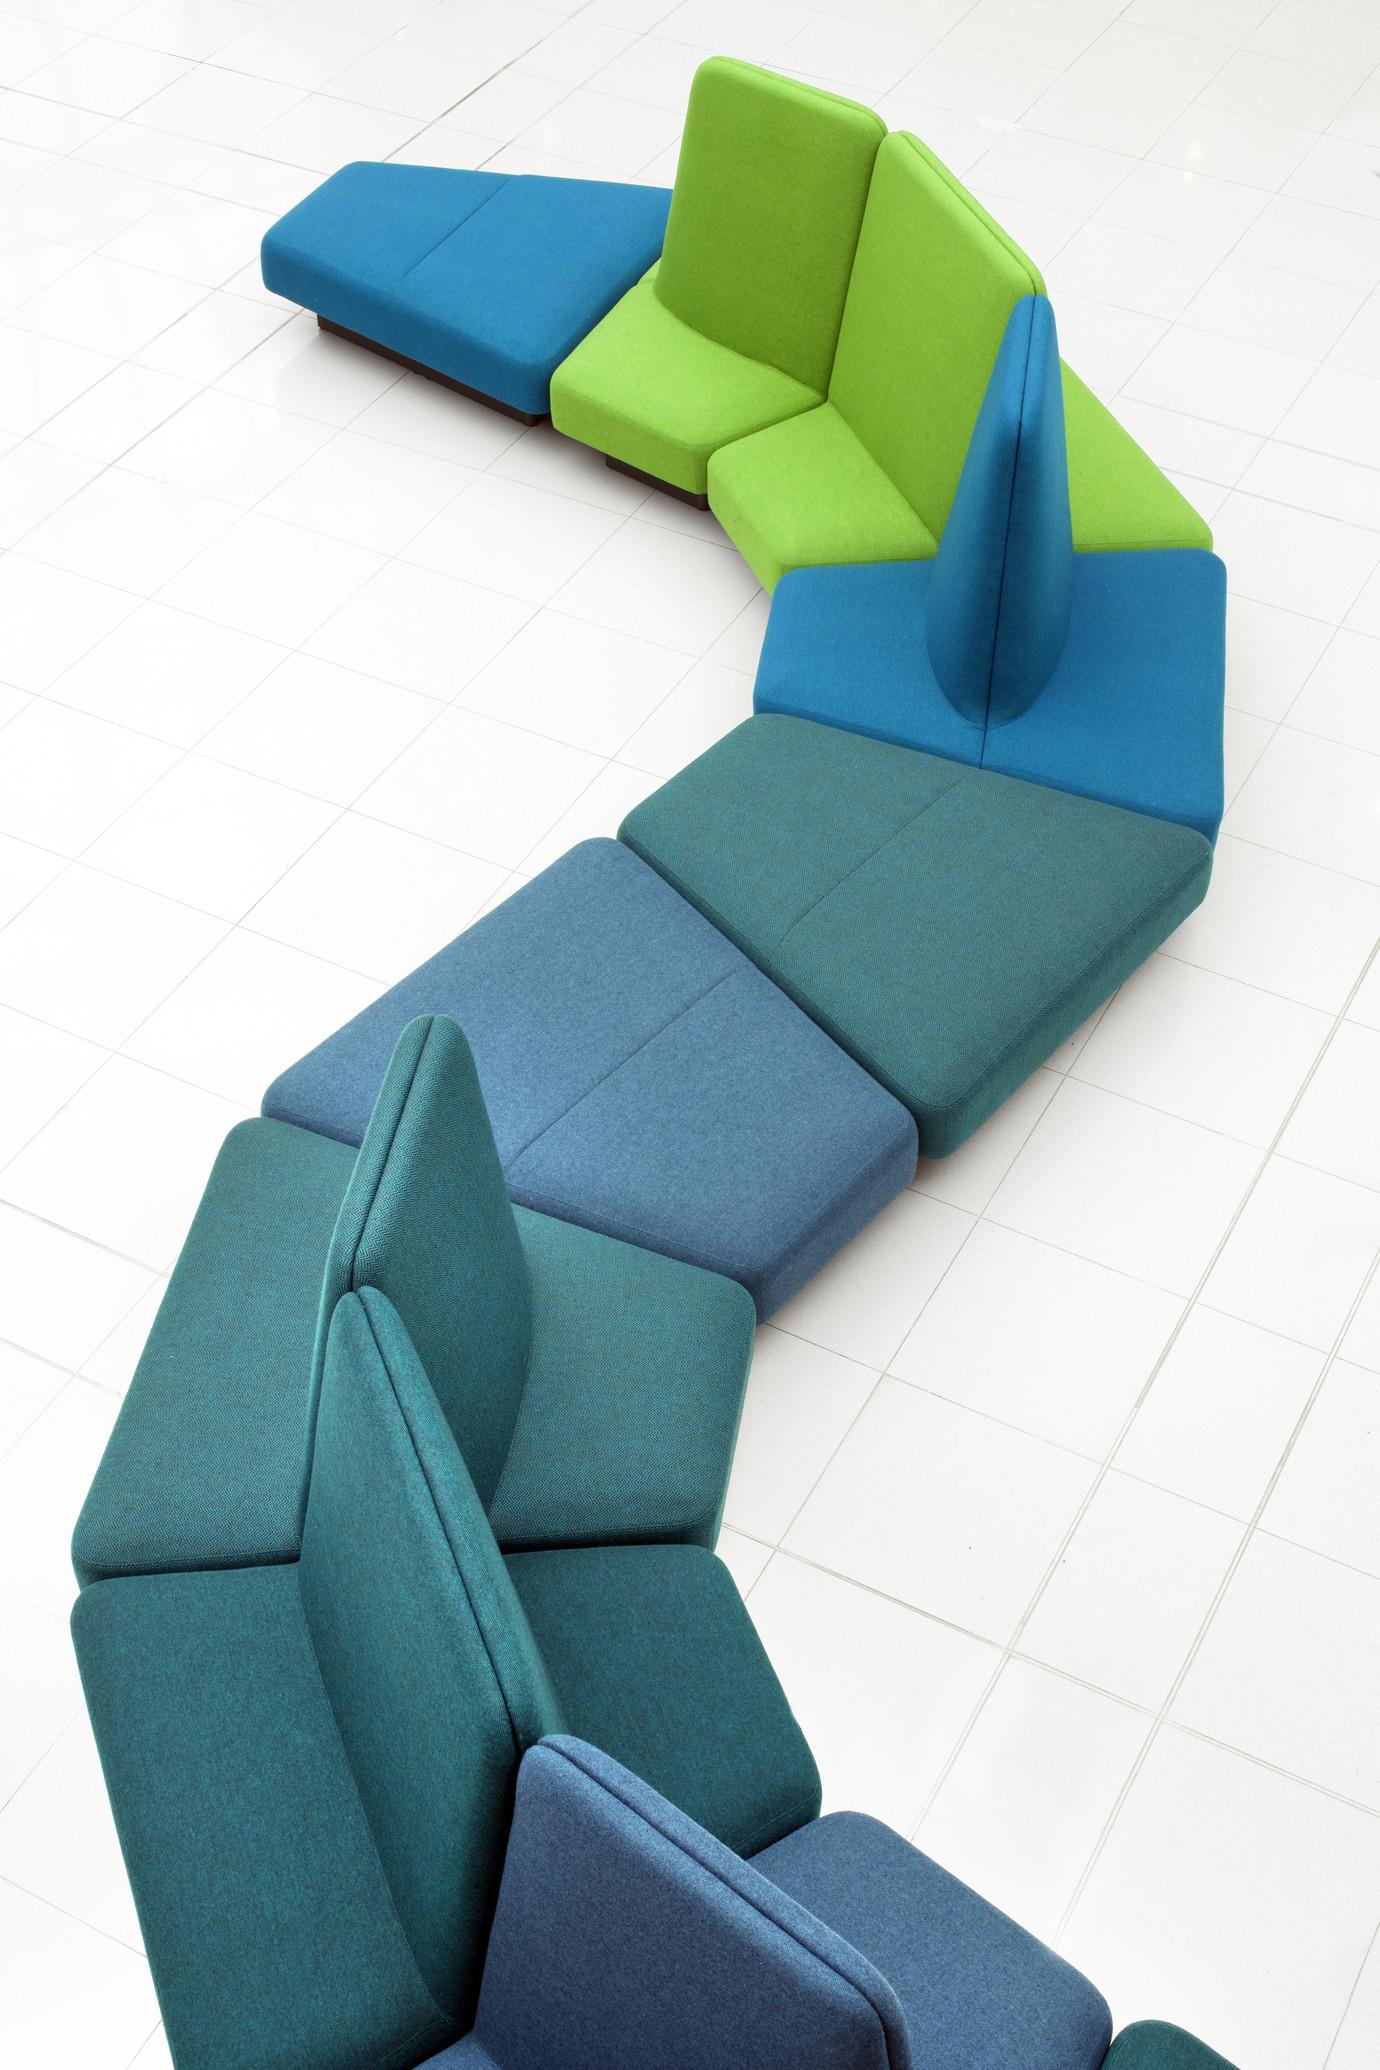 10-Silla-Lounge-Rhyme-Configuracion-1380